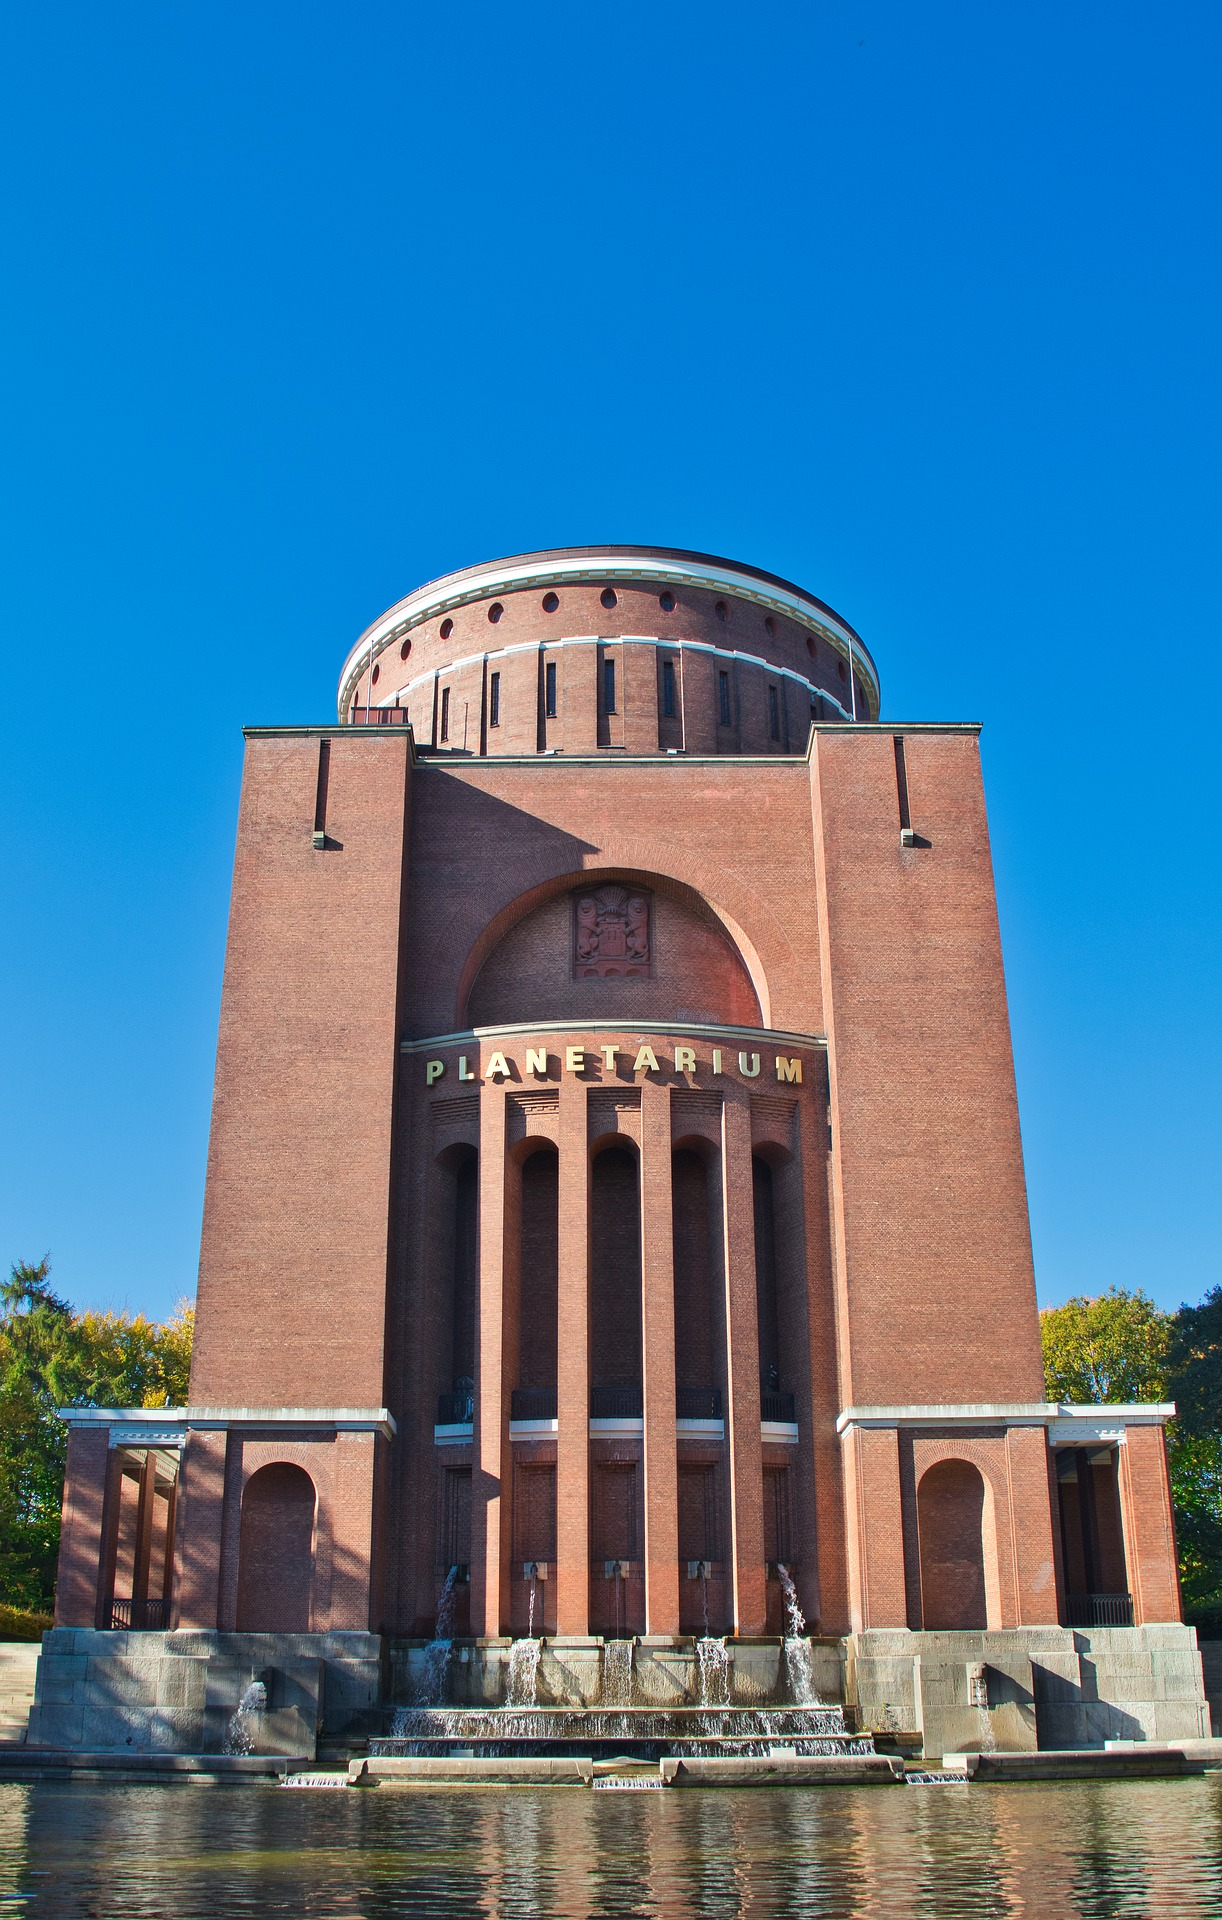 Regional reisen, Urlaub in Hamburg, Planetarium am Stadtpark